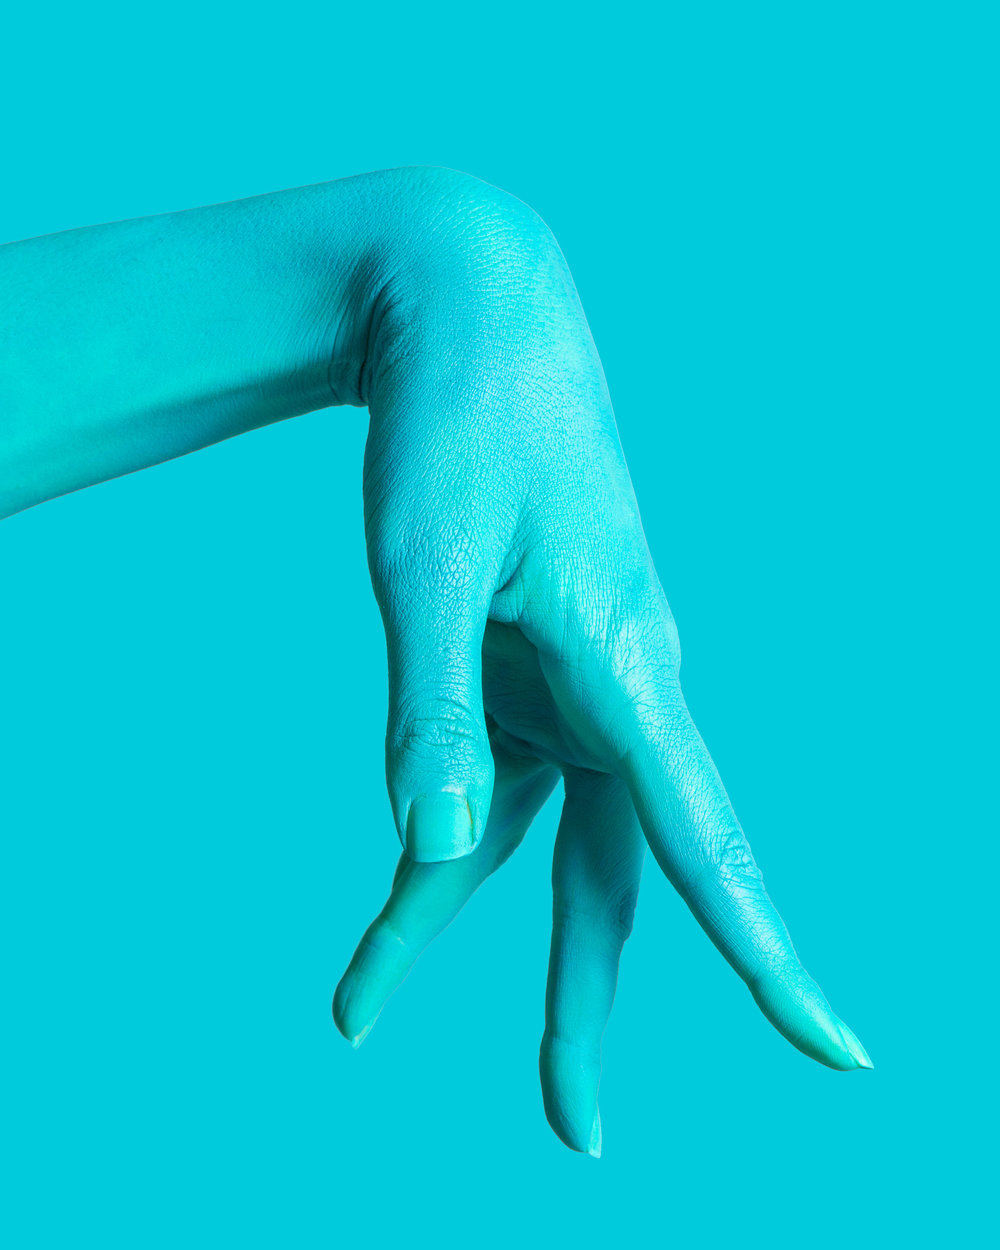 20170127_0612 Blue Hand.jpg